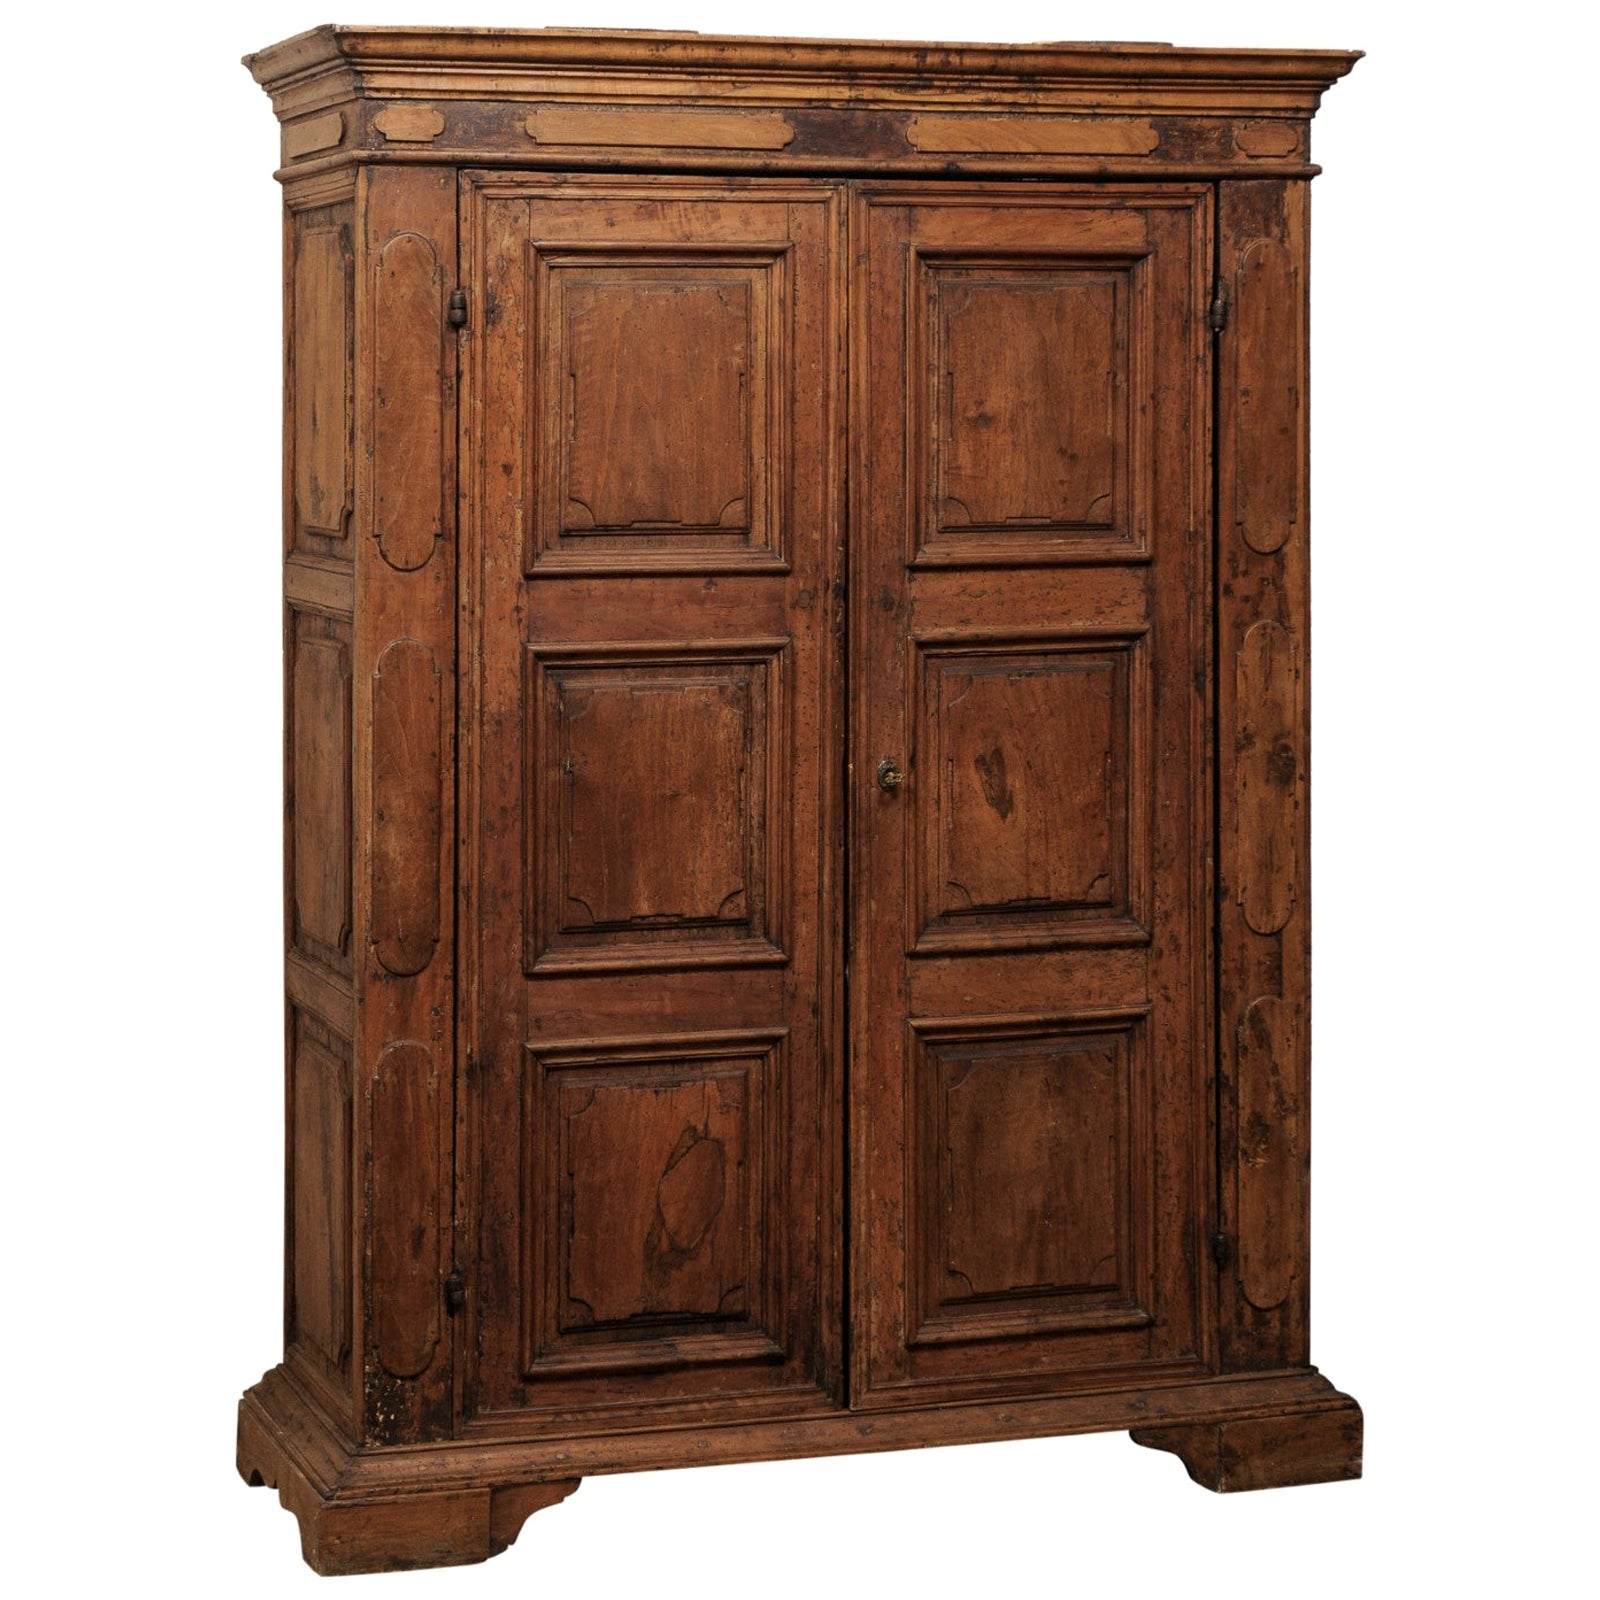 Beautiful Italian Walnut Two-Door Cabinet, Turn of 18th and 19th Century